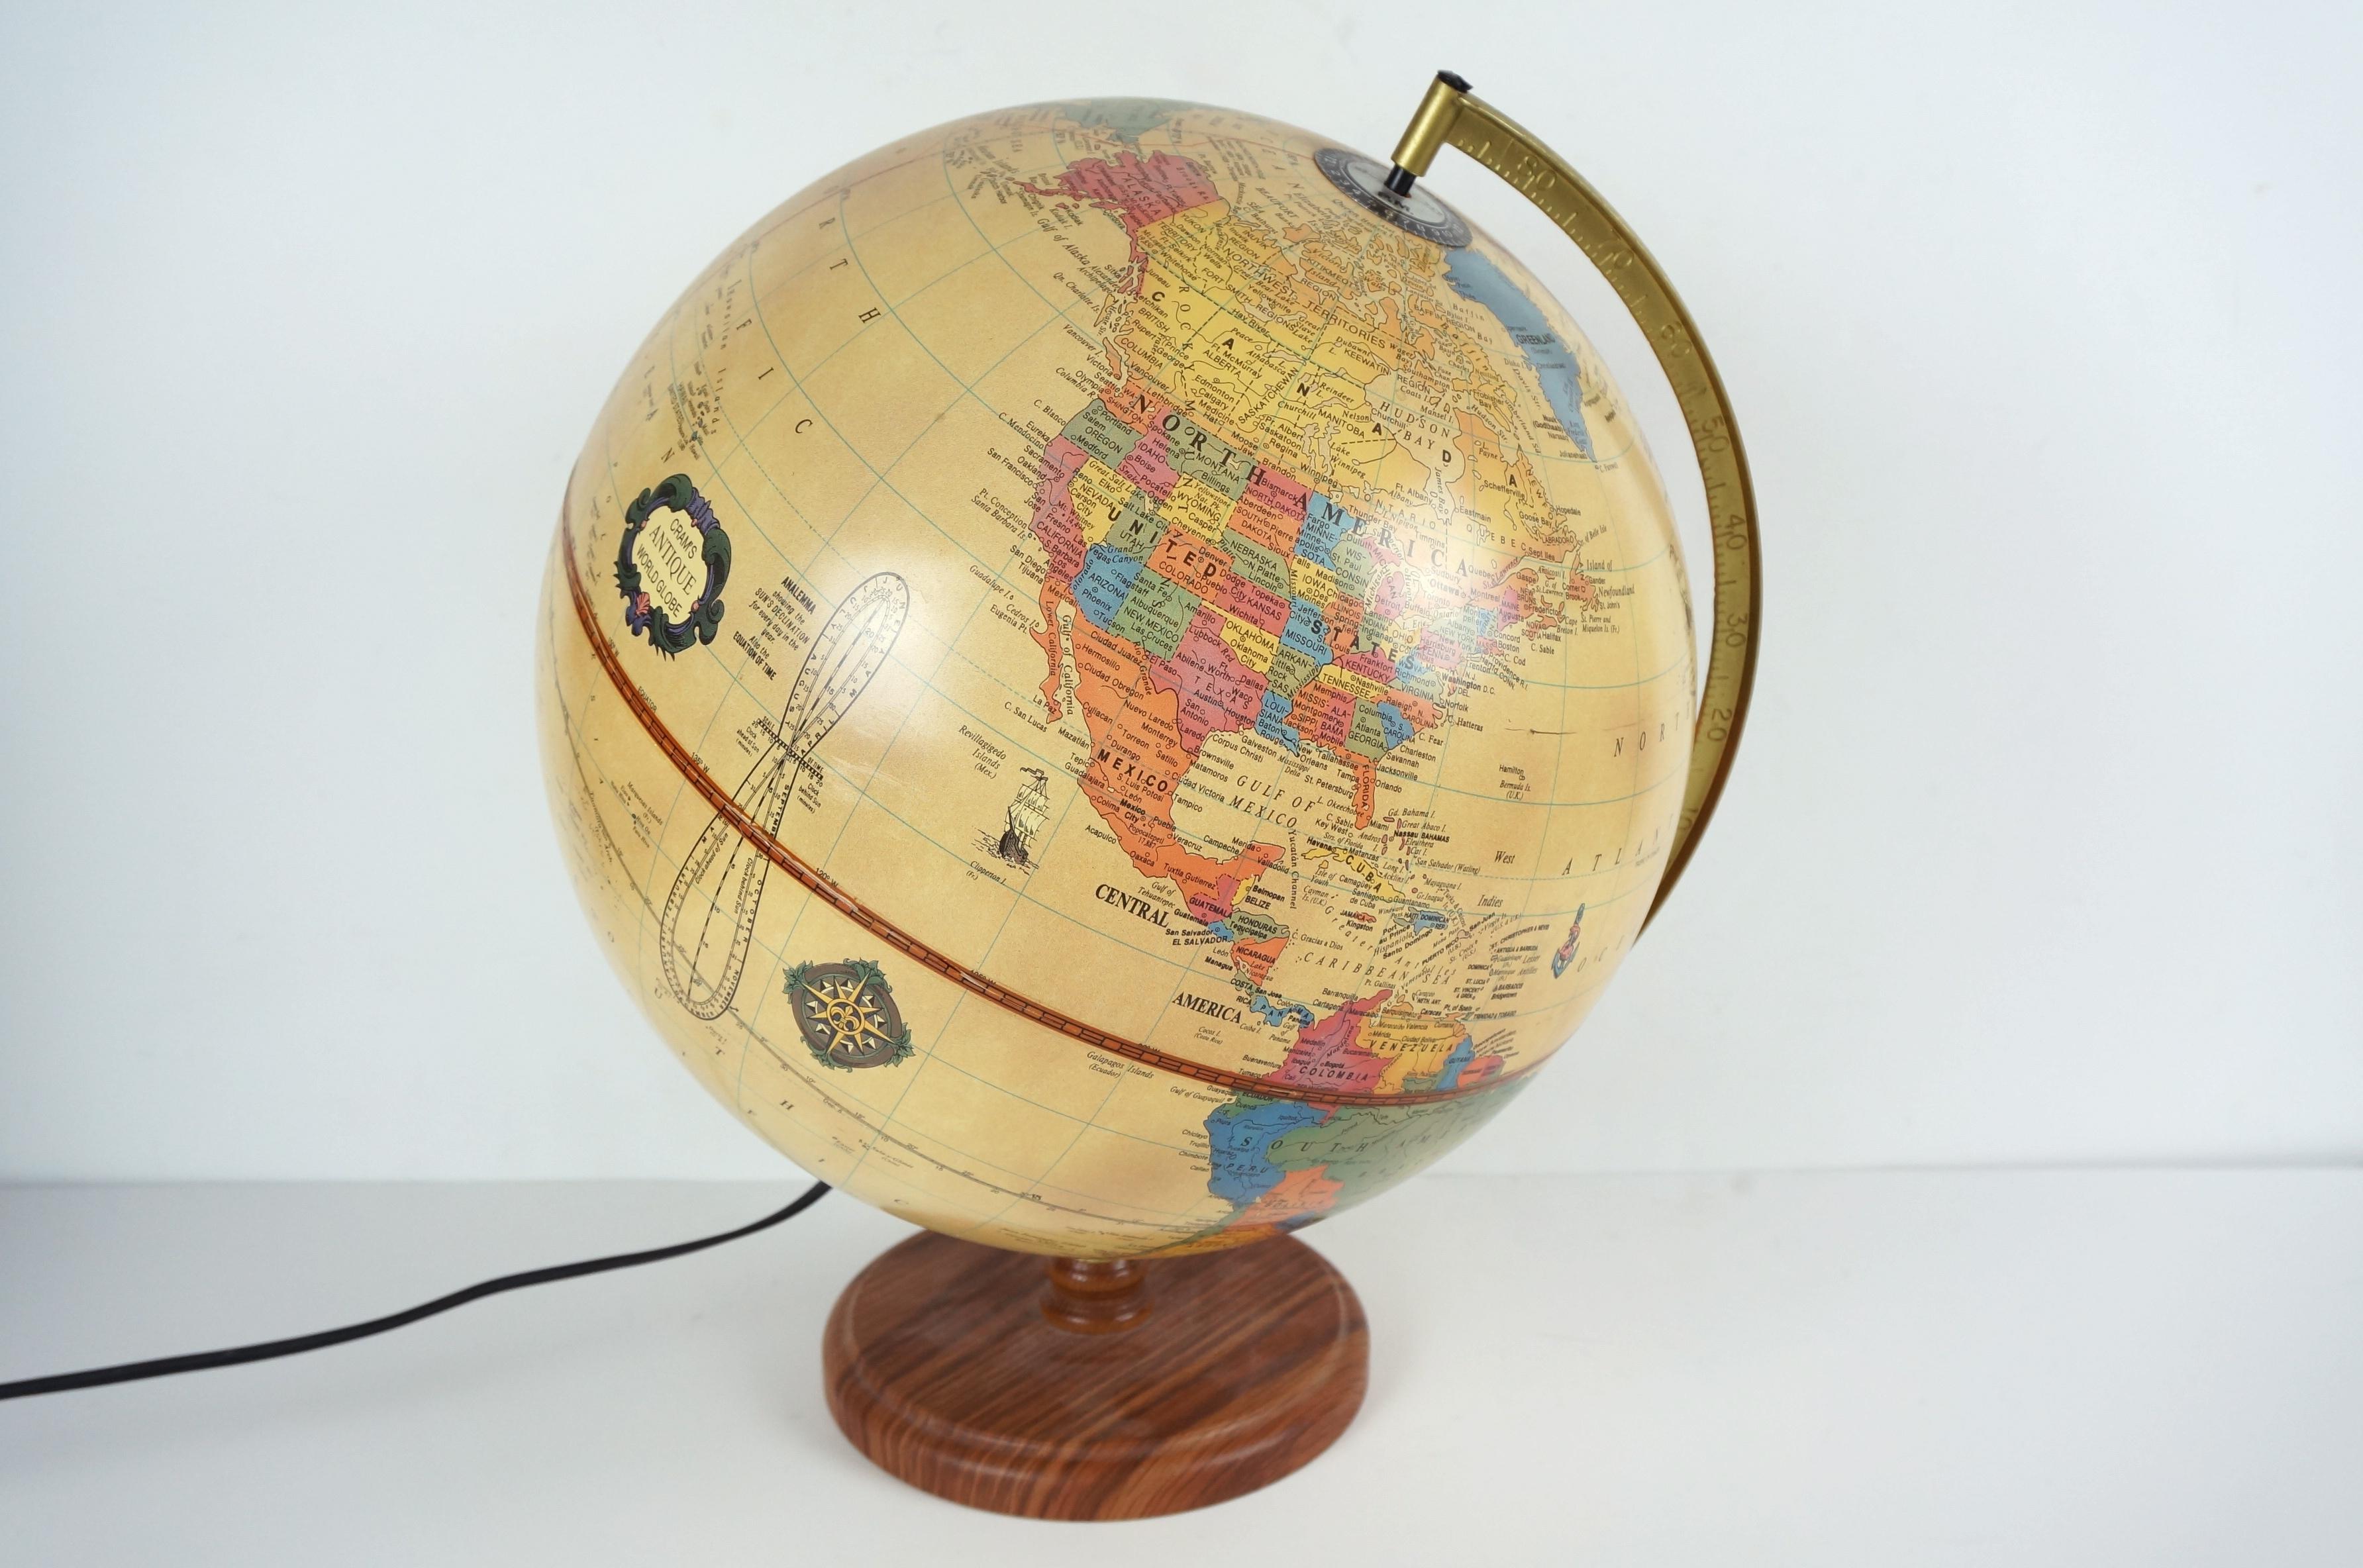 Vintage Maps for Sale Antique Maps for Sale Framed Map Auction